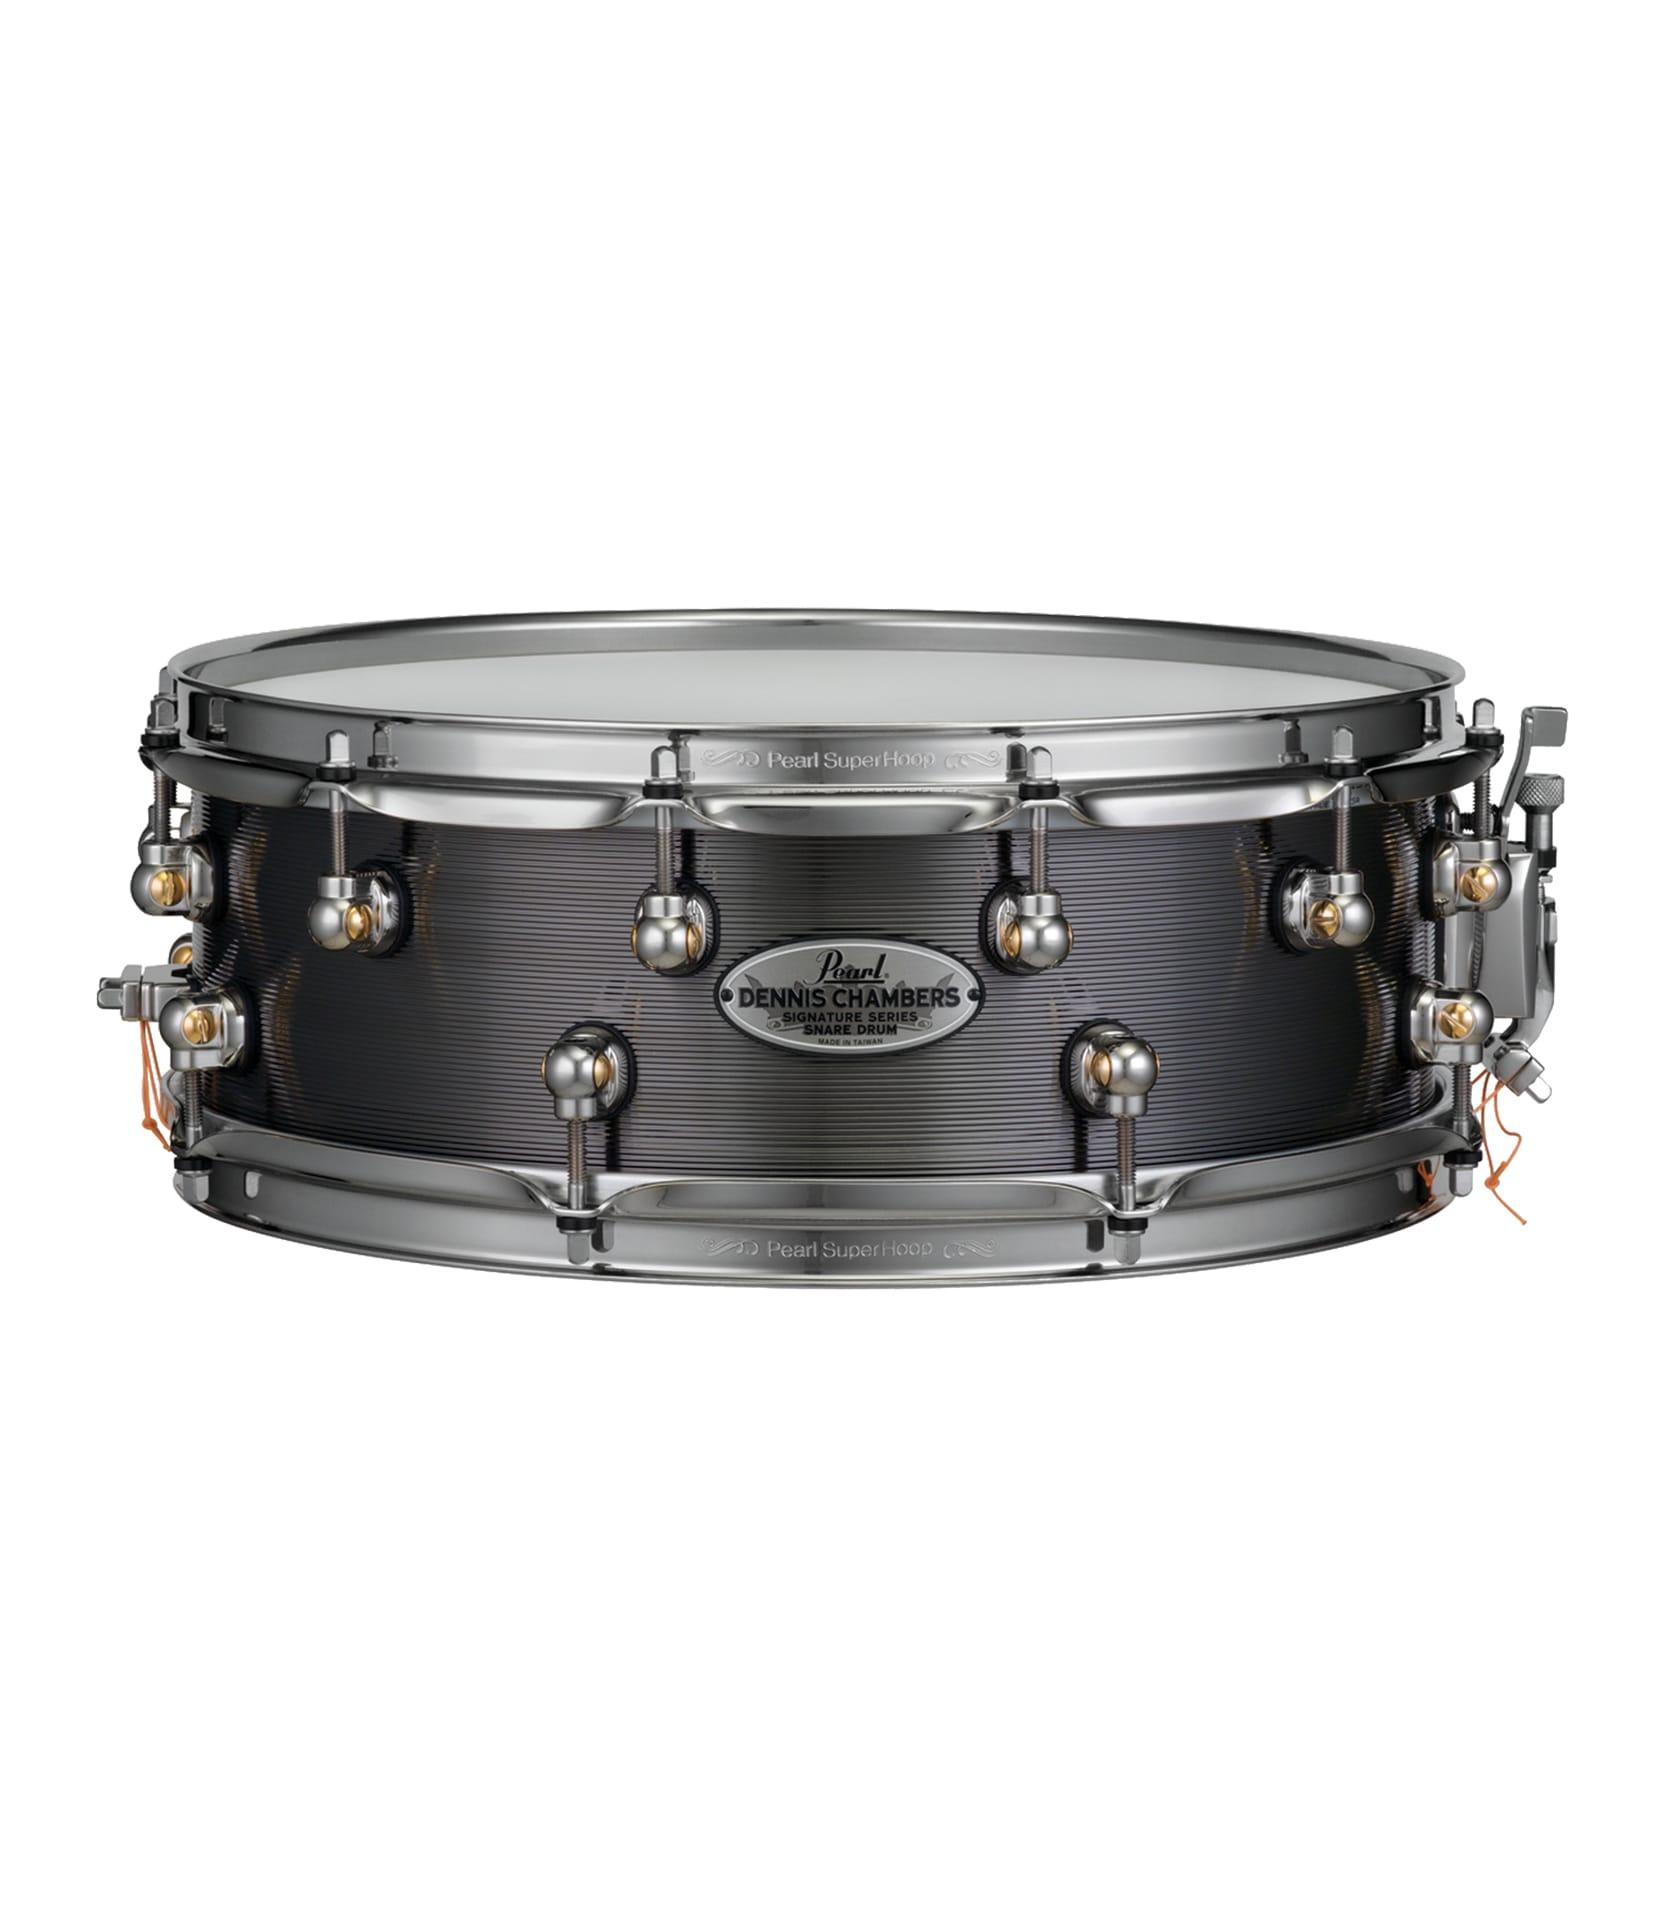 buy pearl dc1450s n dennis chambers 14x5 0 snare drum